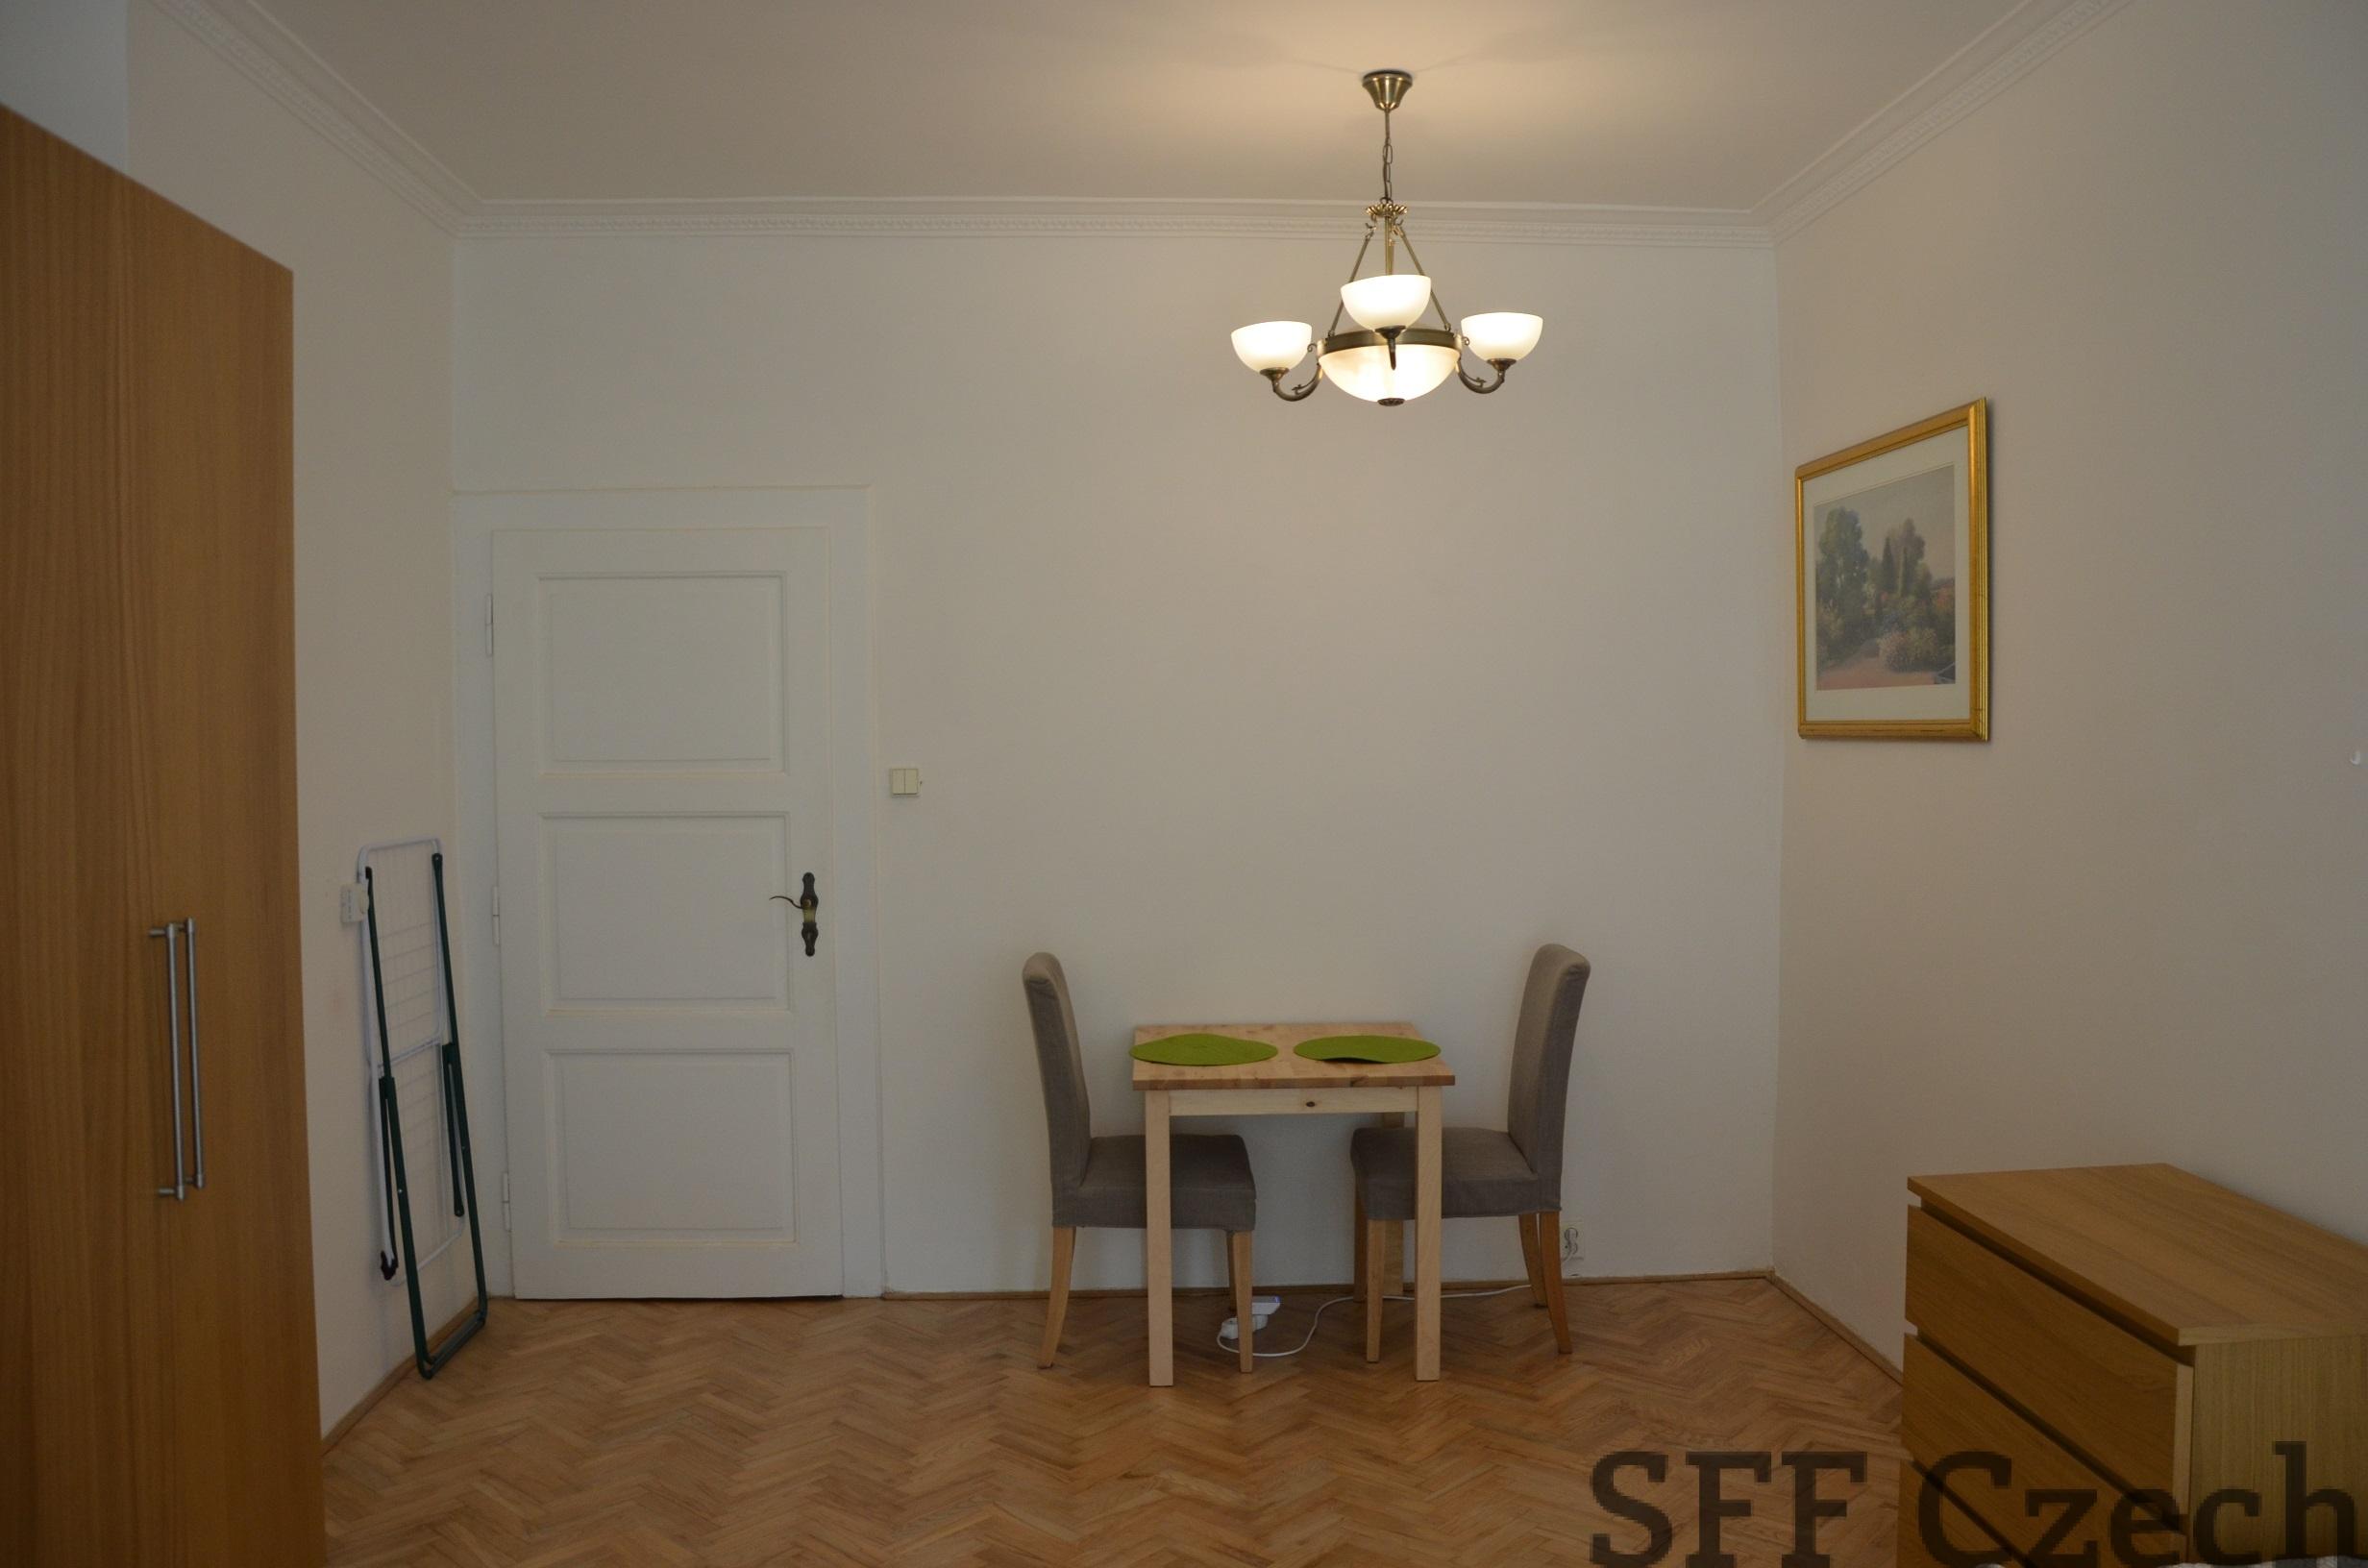 Students cheap flatshare Prague 10, Pod vinici